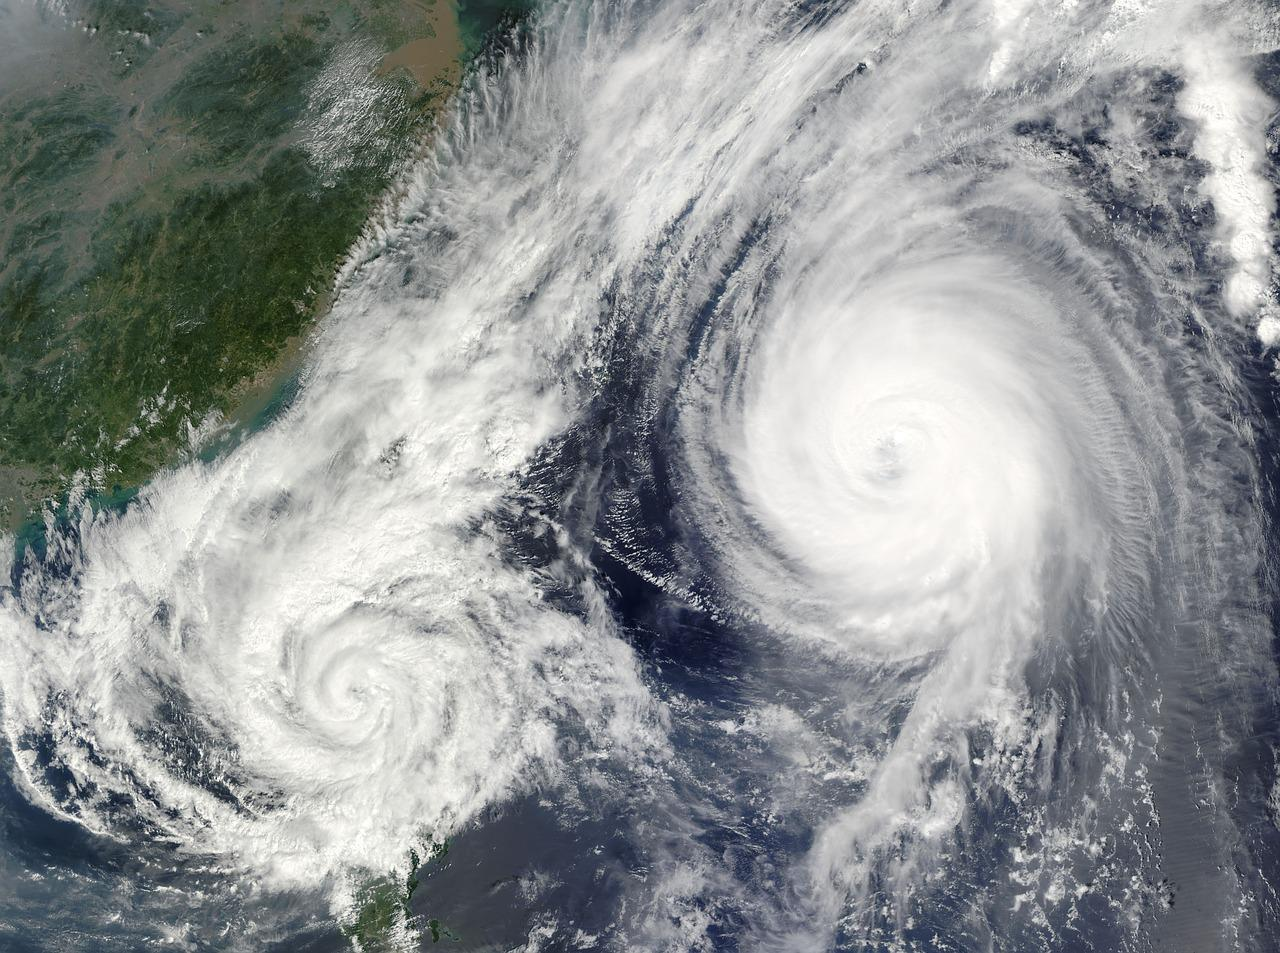 台風25号2018の進路情報最新と予想